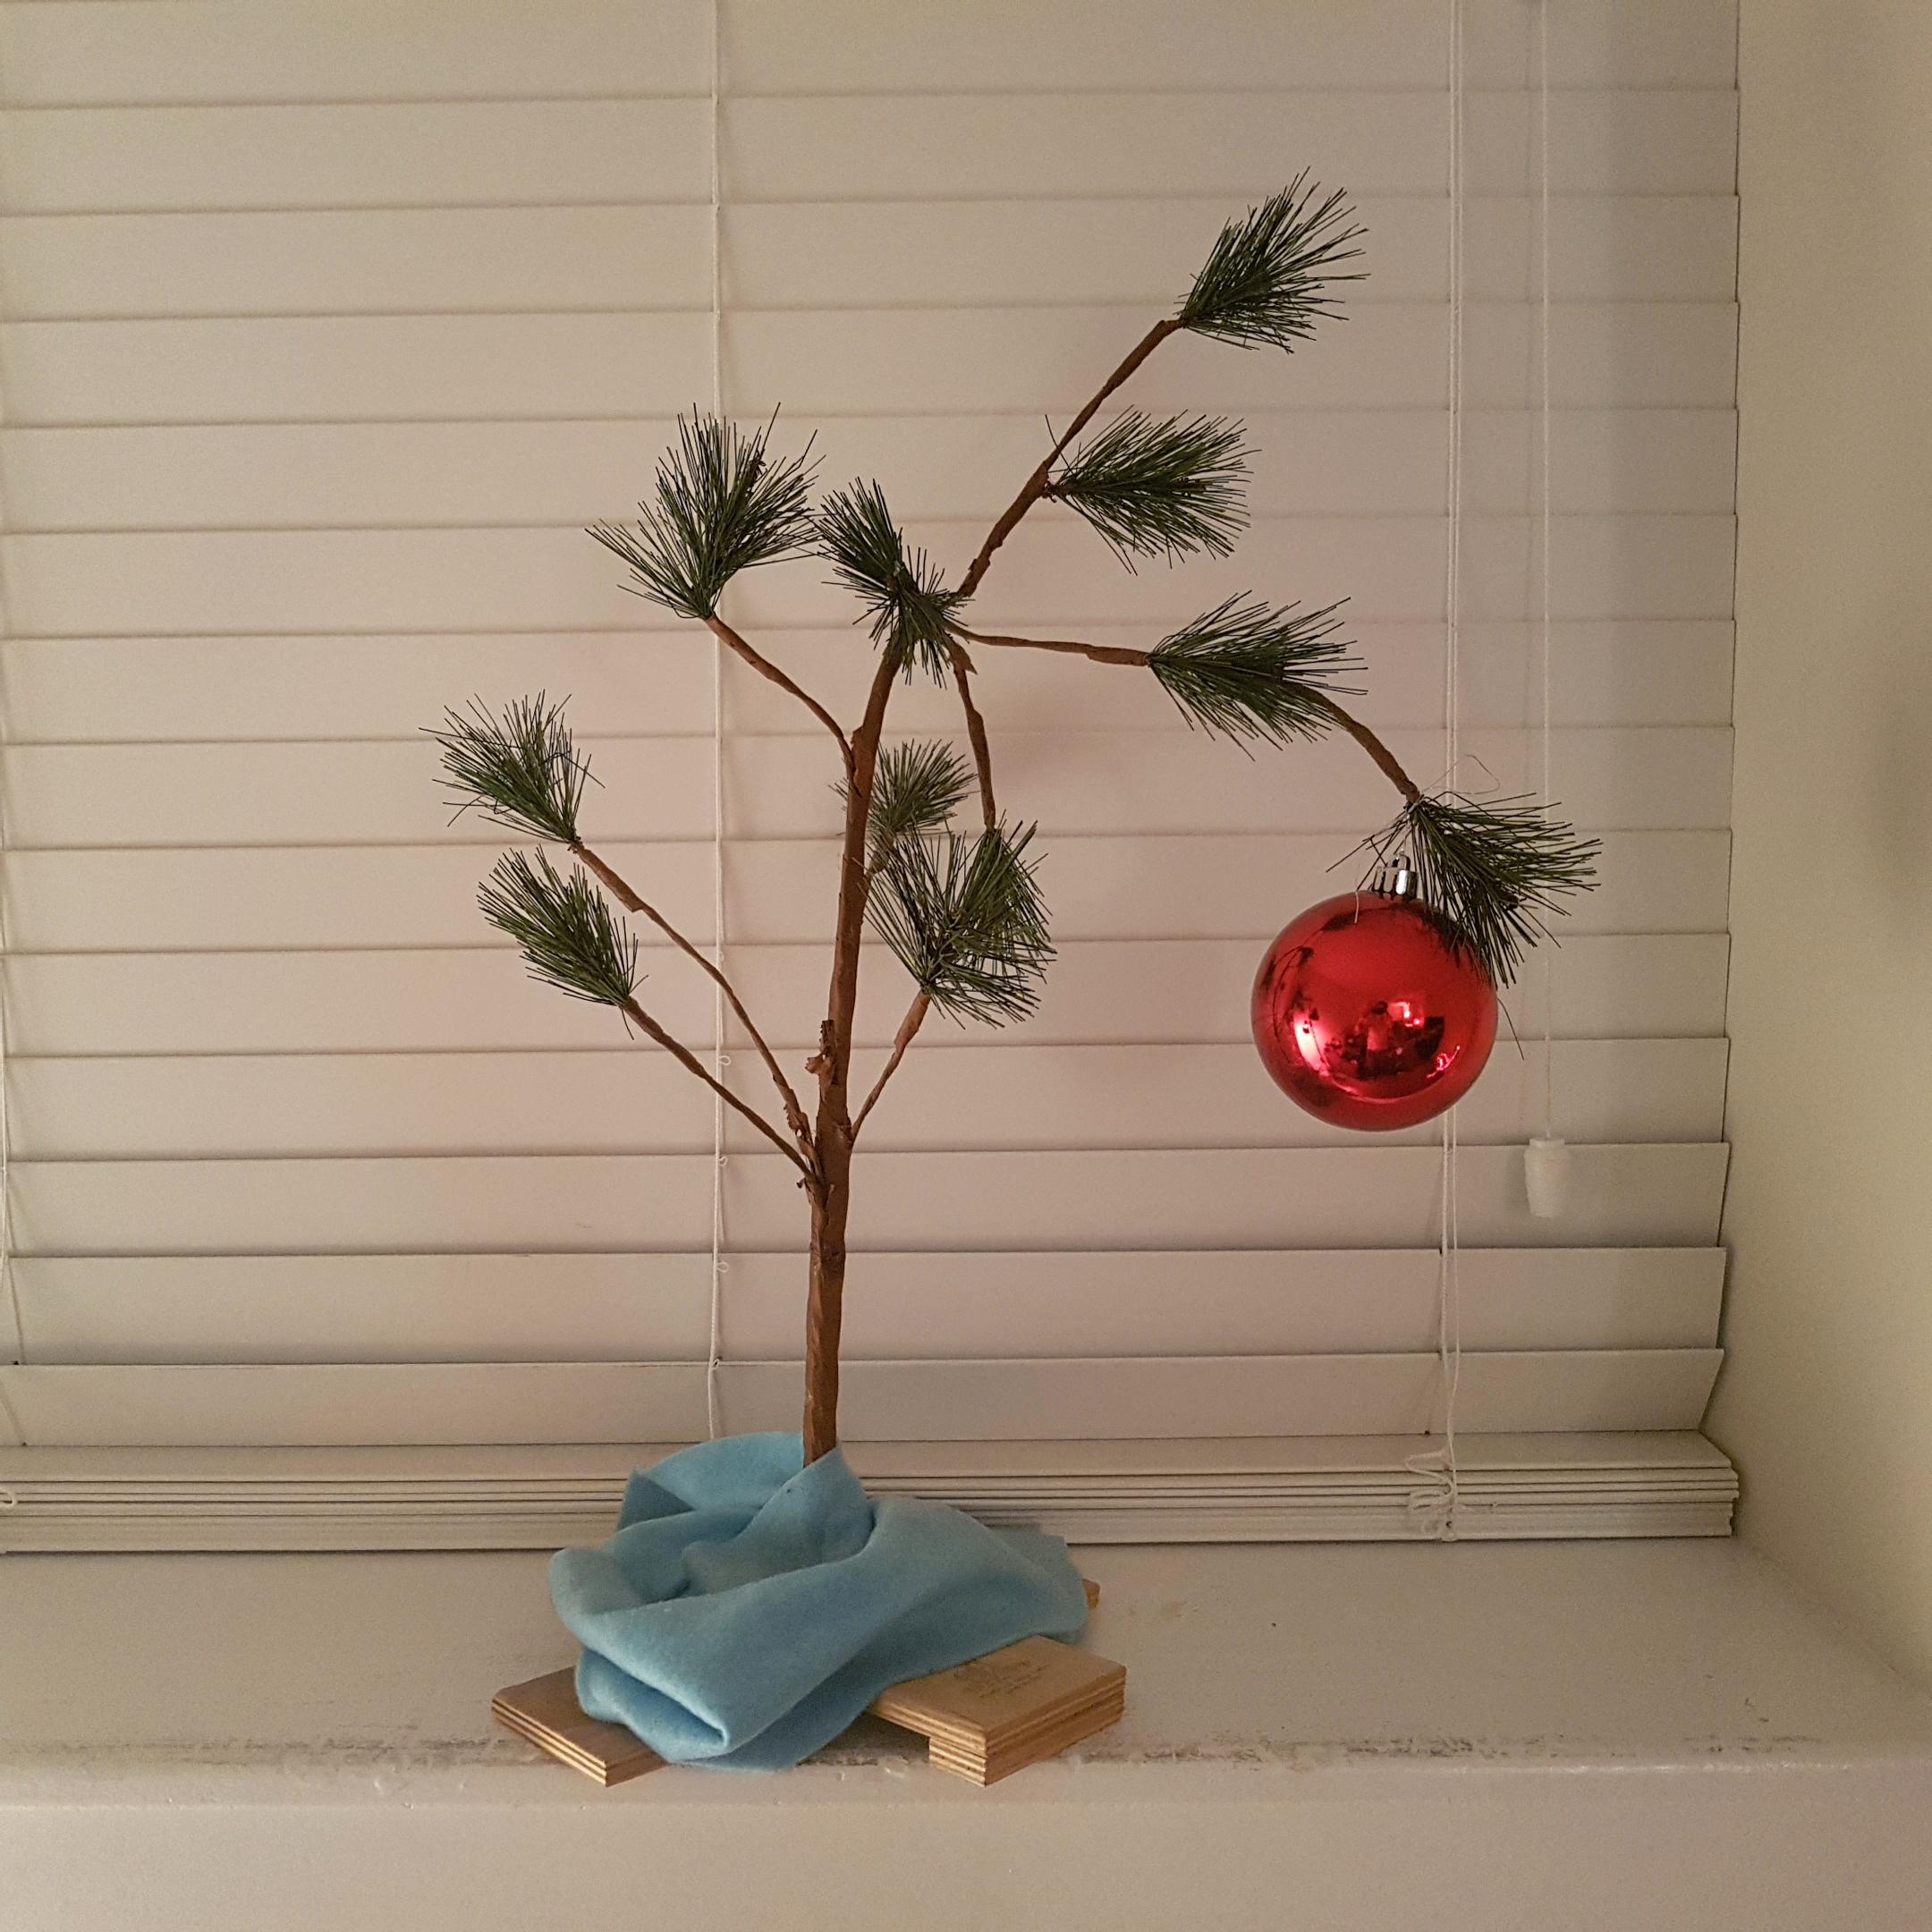 THE ORIGINAL CHARLIE BROWN CHRISTMAS TREE CHRISTMAS DECORATION